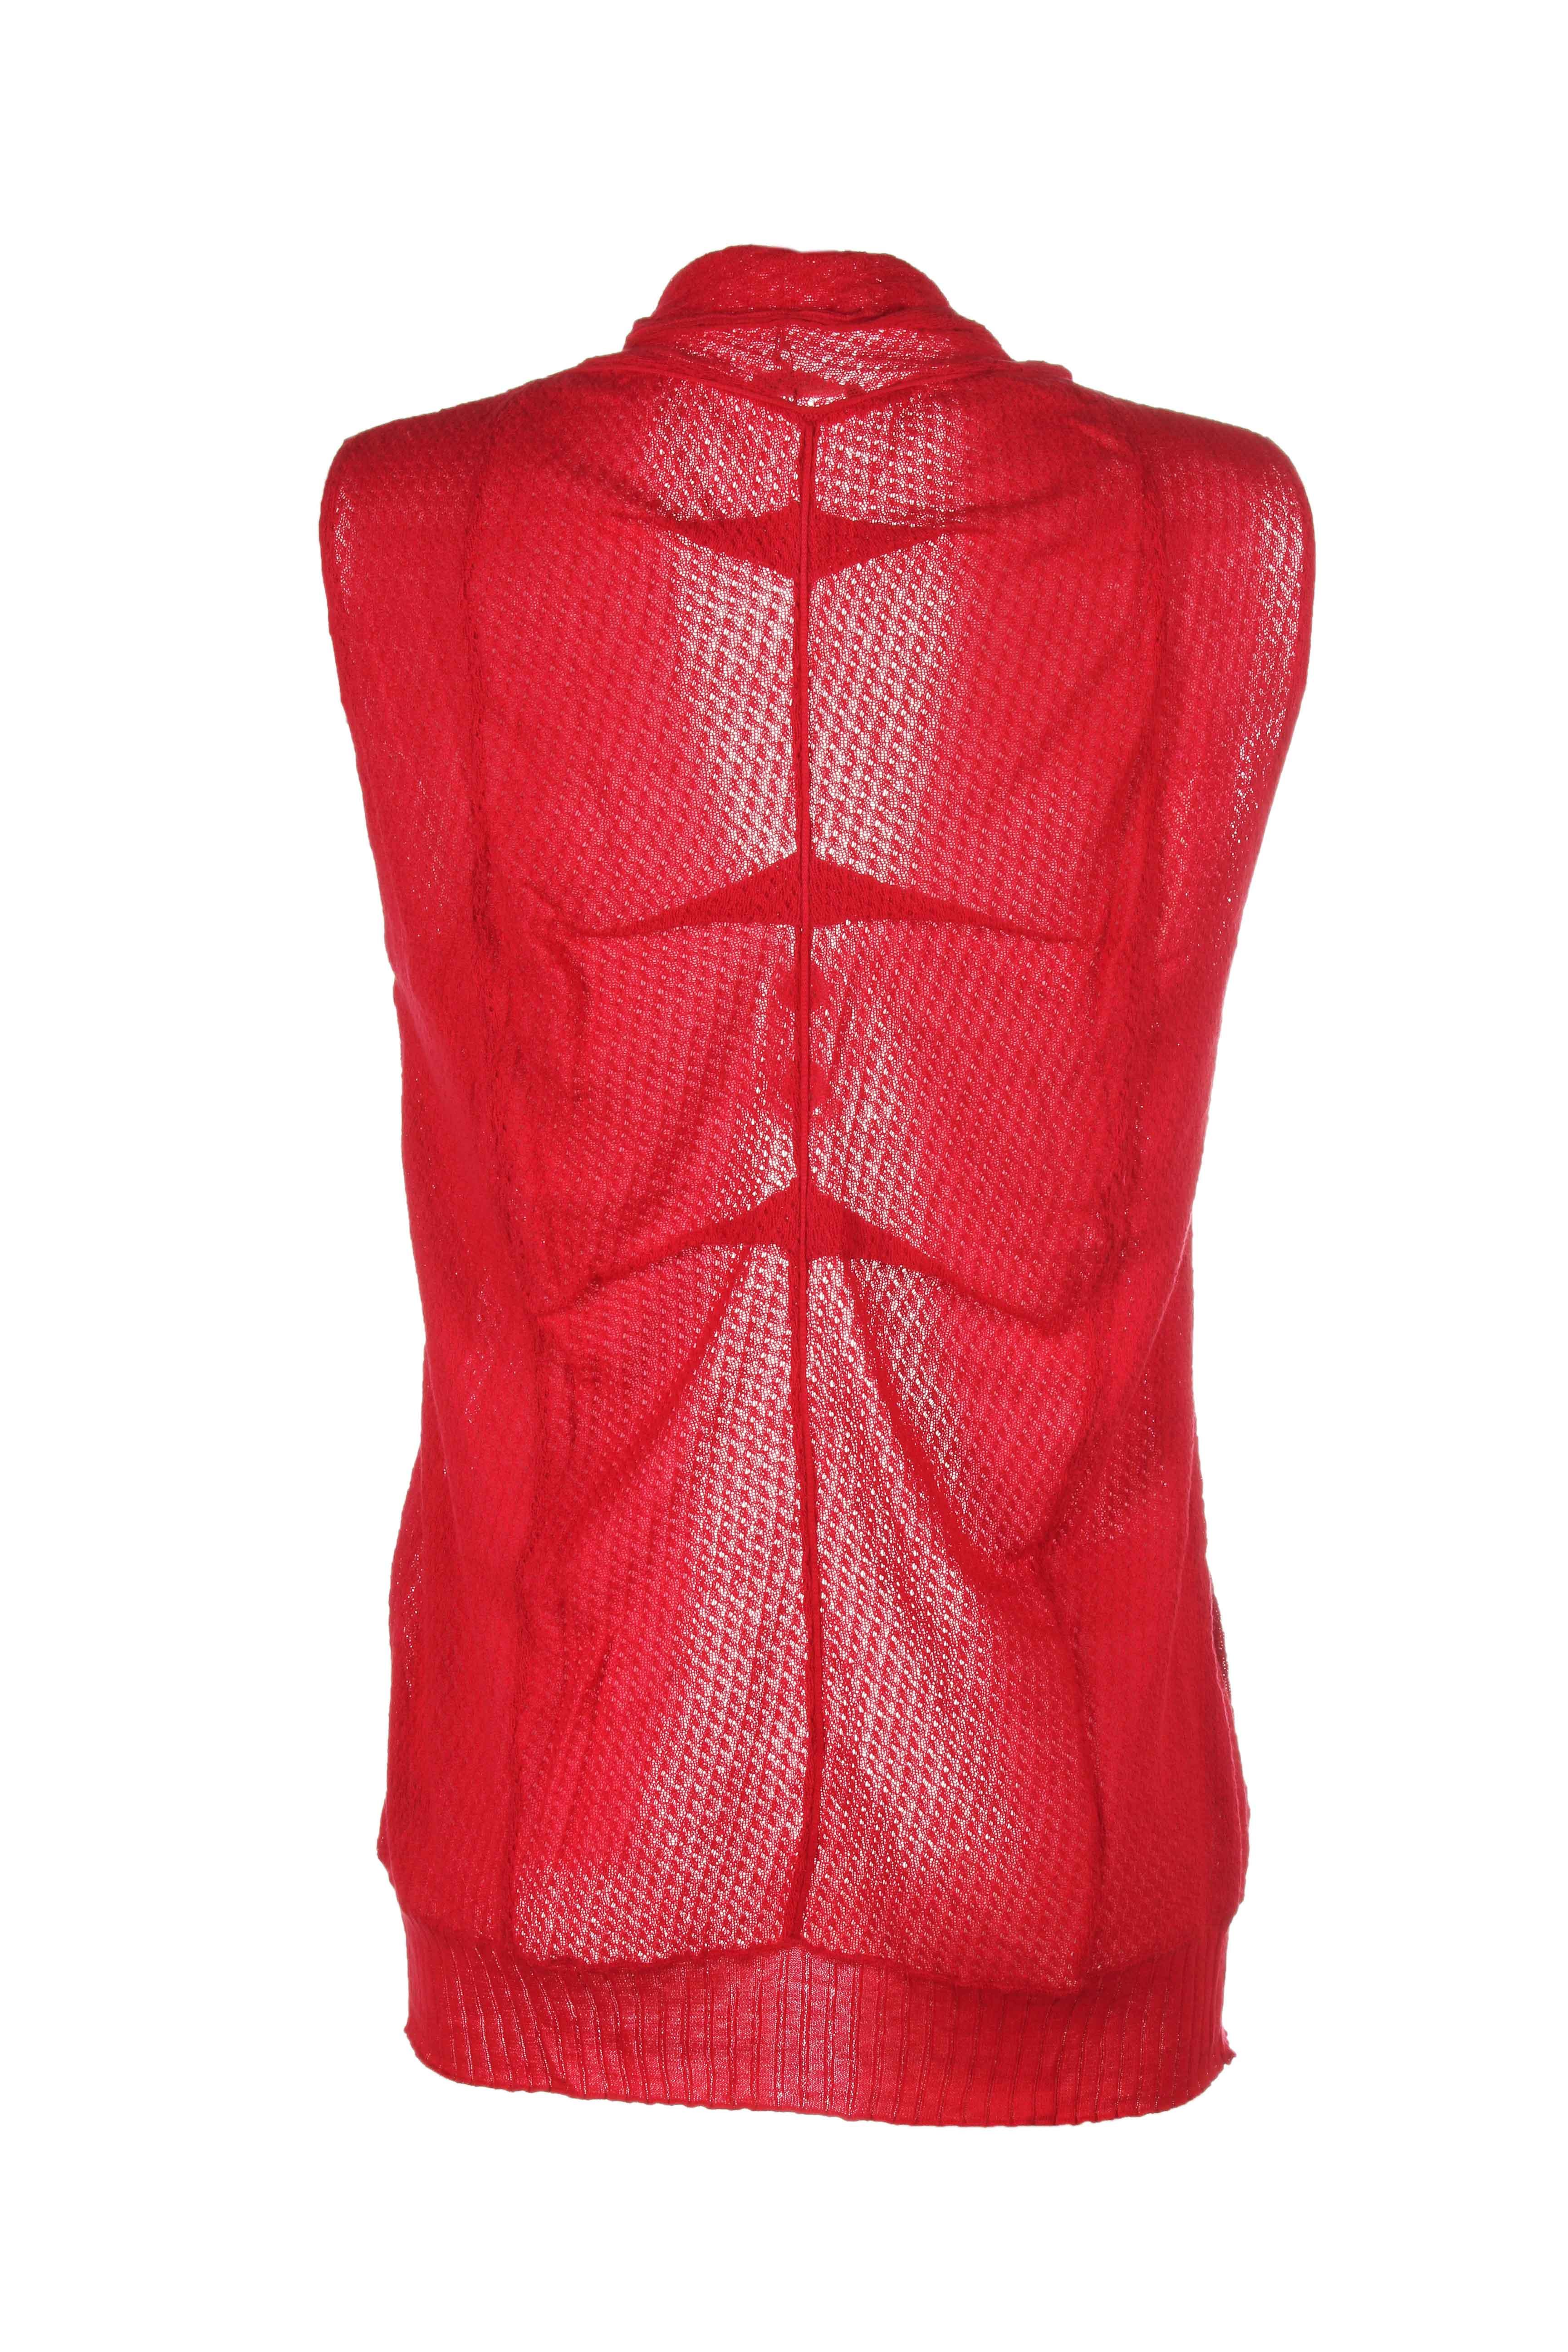 bande originale gilet femme de couleur rouge en soldes pas cher 204312 rouge0 modz. Black Bedroom Furniture Sets. Home Design Ideas